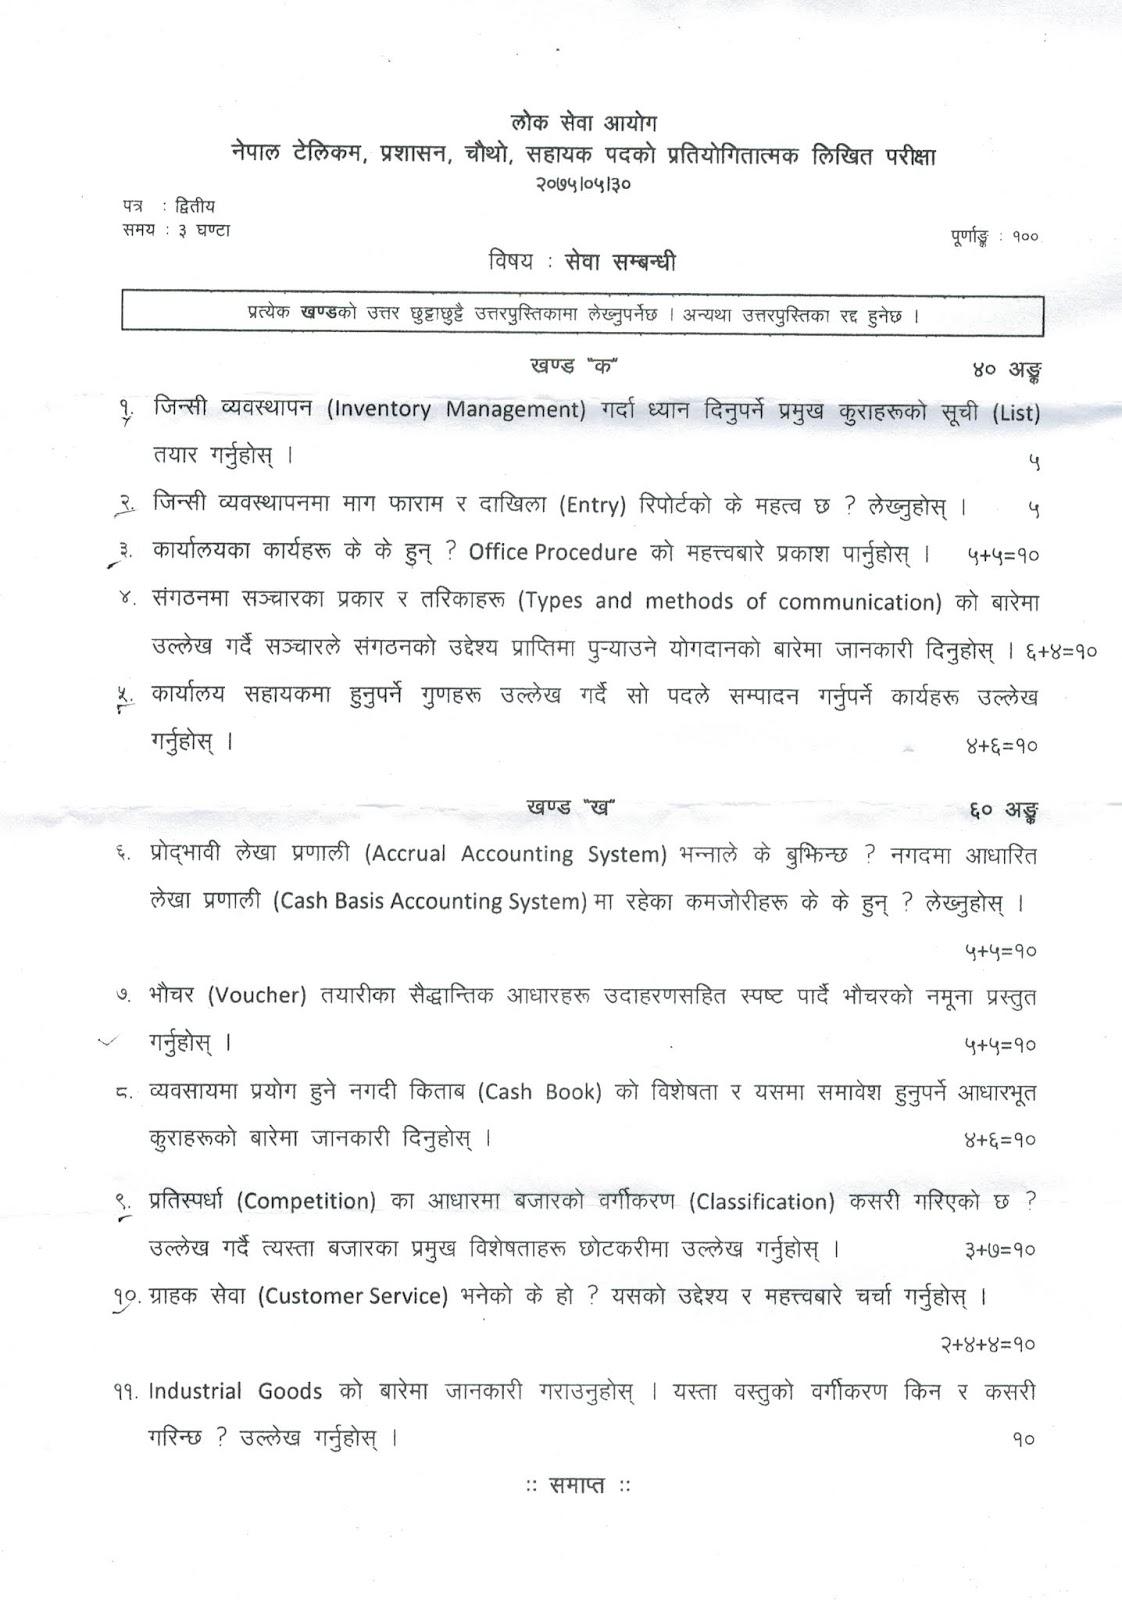 Nepal Telecom Assistant Level 4 Second Paper 2075